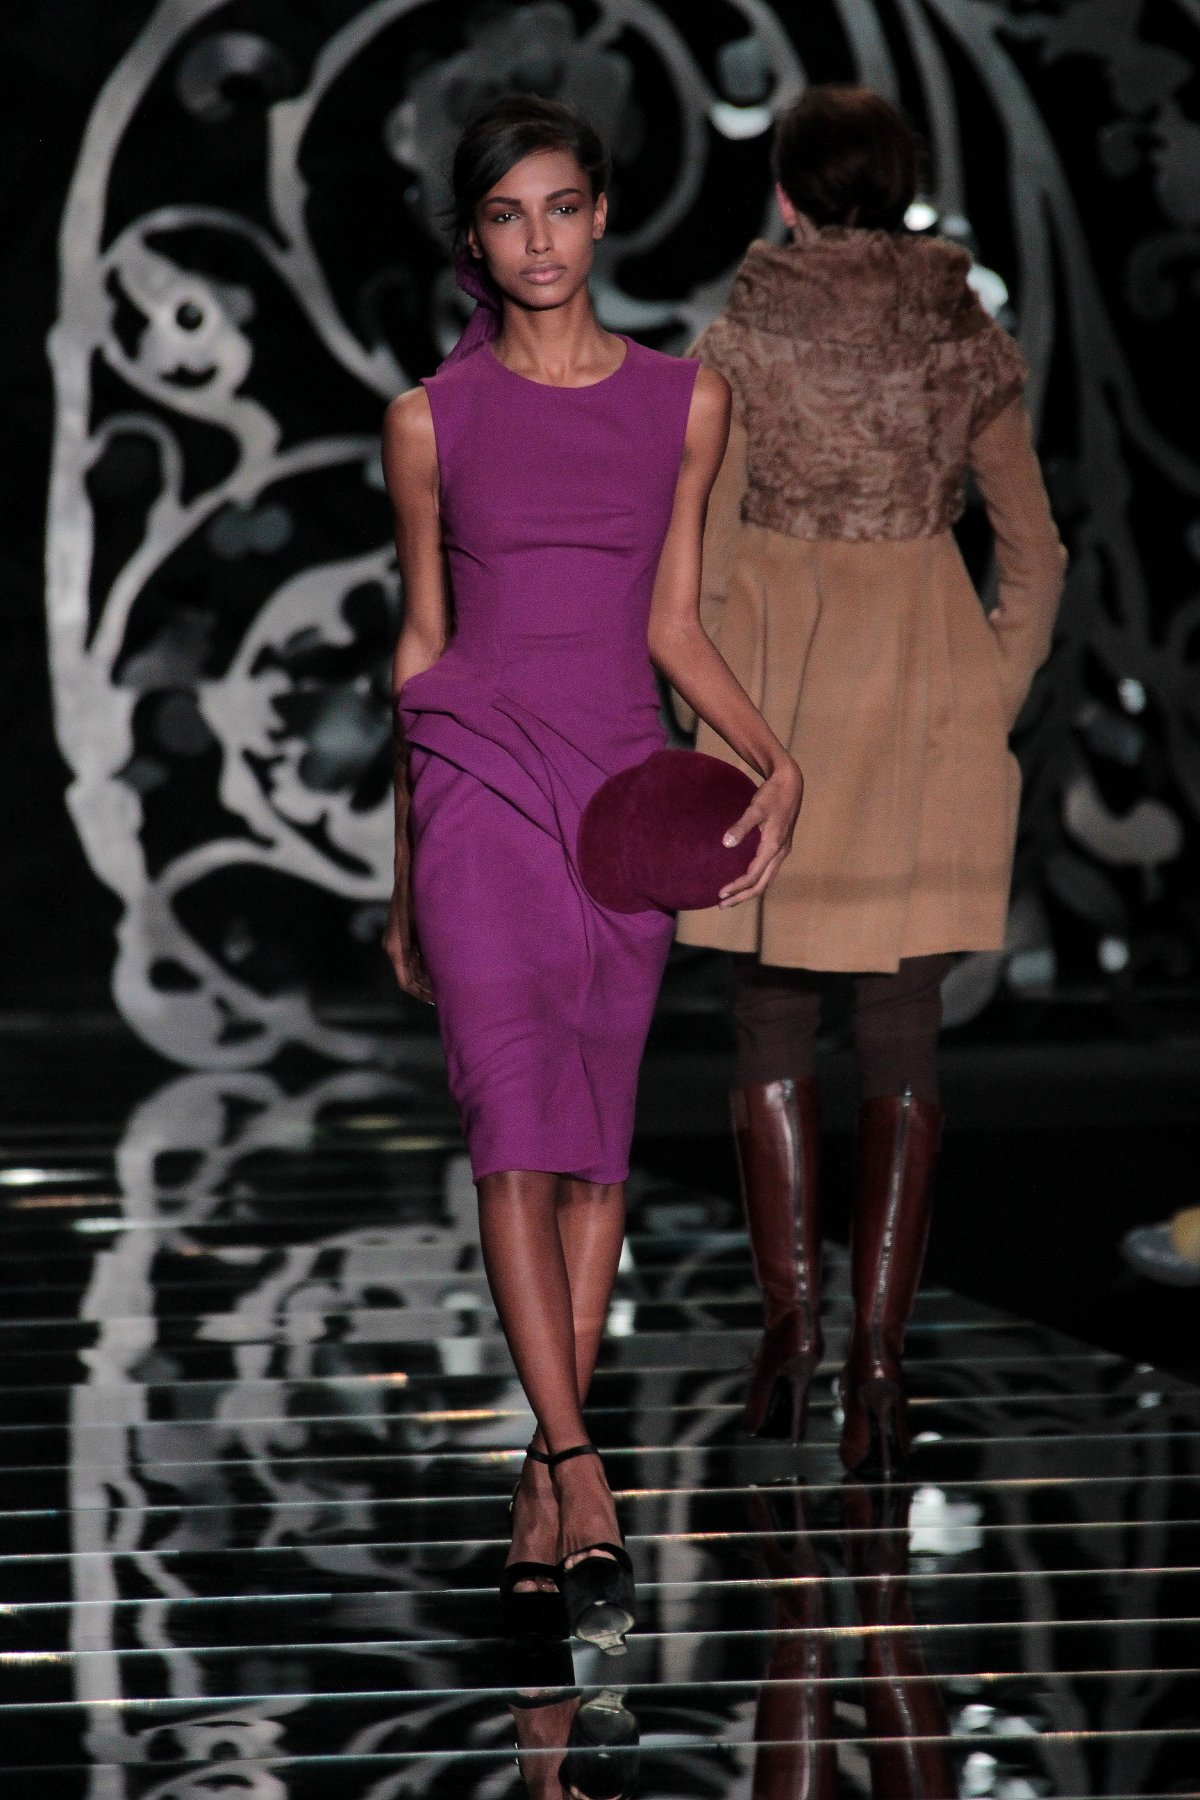 Ermanno Scervino Fall-Winter 2012 Women Fashion Show Catwalk Milano Fashion Week